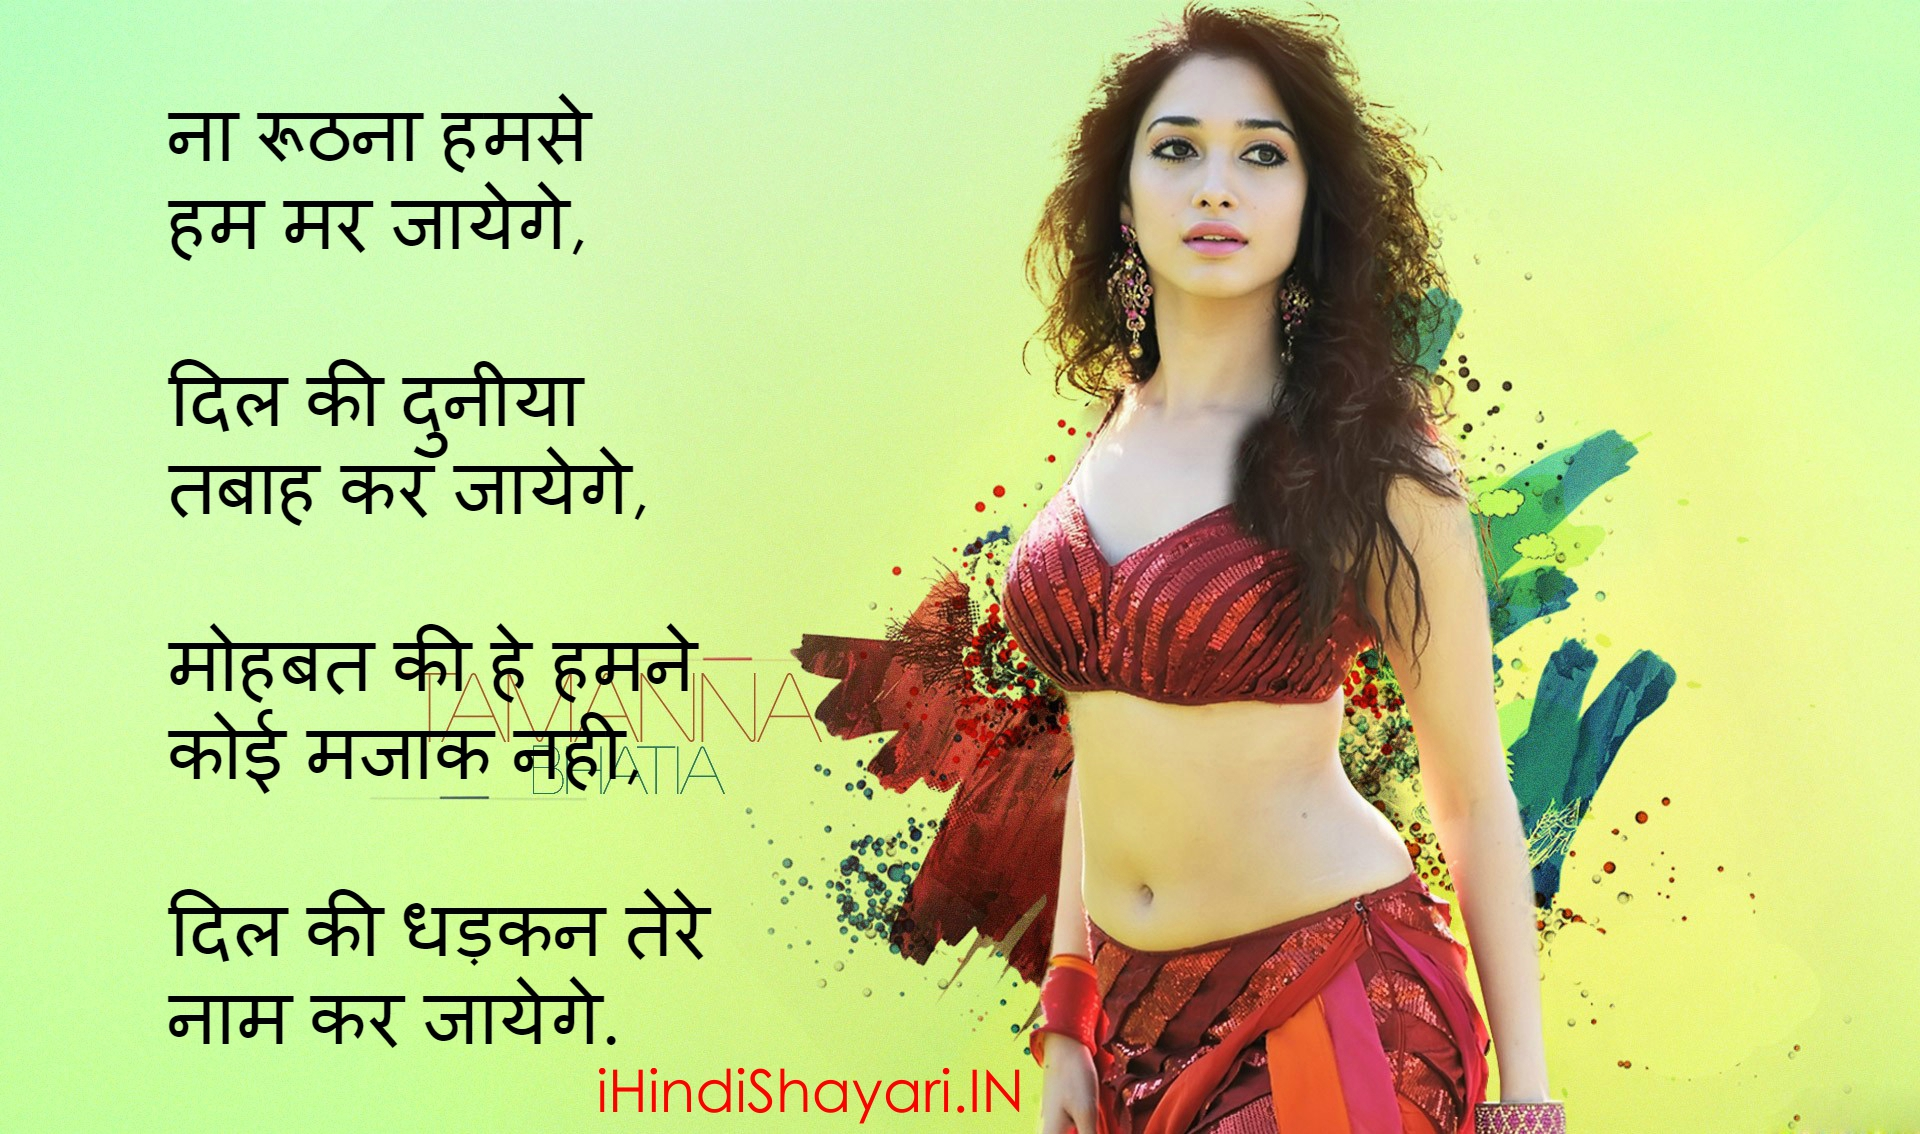 ... - Shayari Sad Hindi Shayari Painful Love Shayari Dard Bhari Shayari